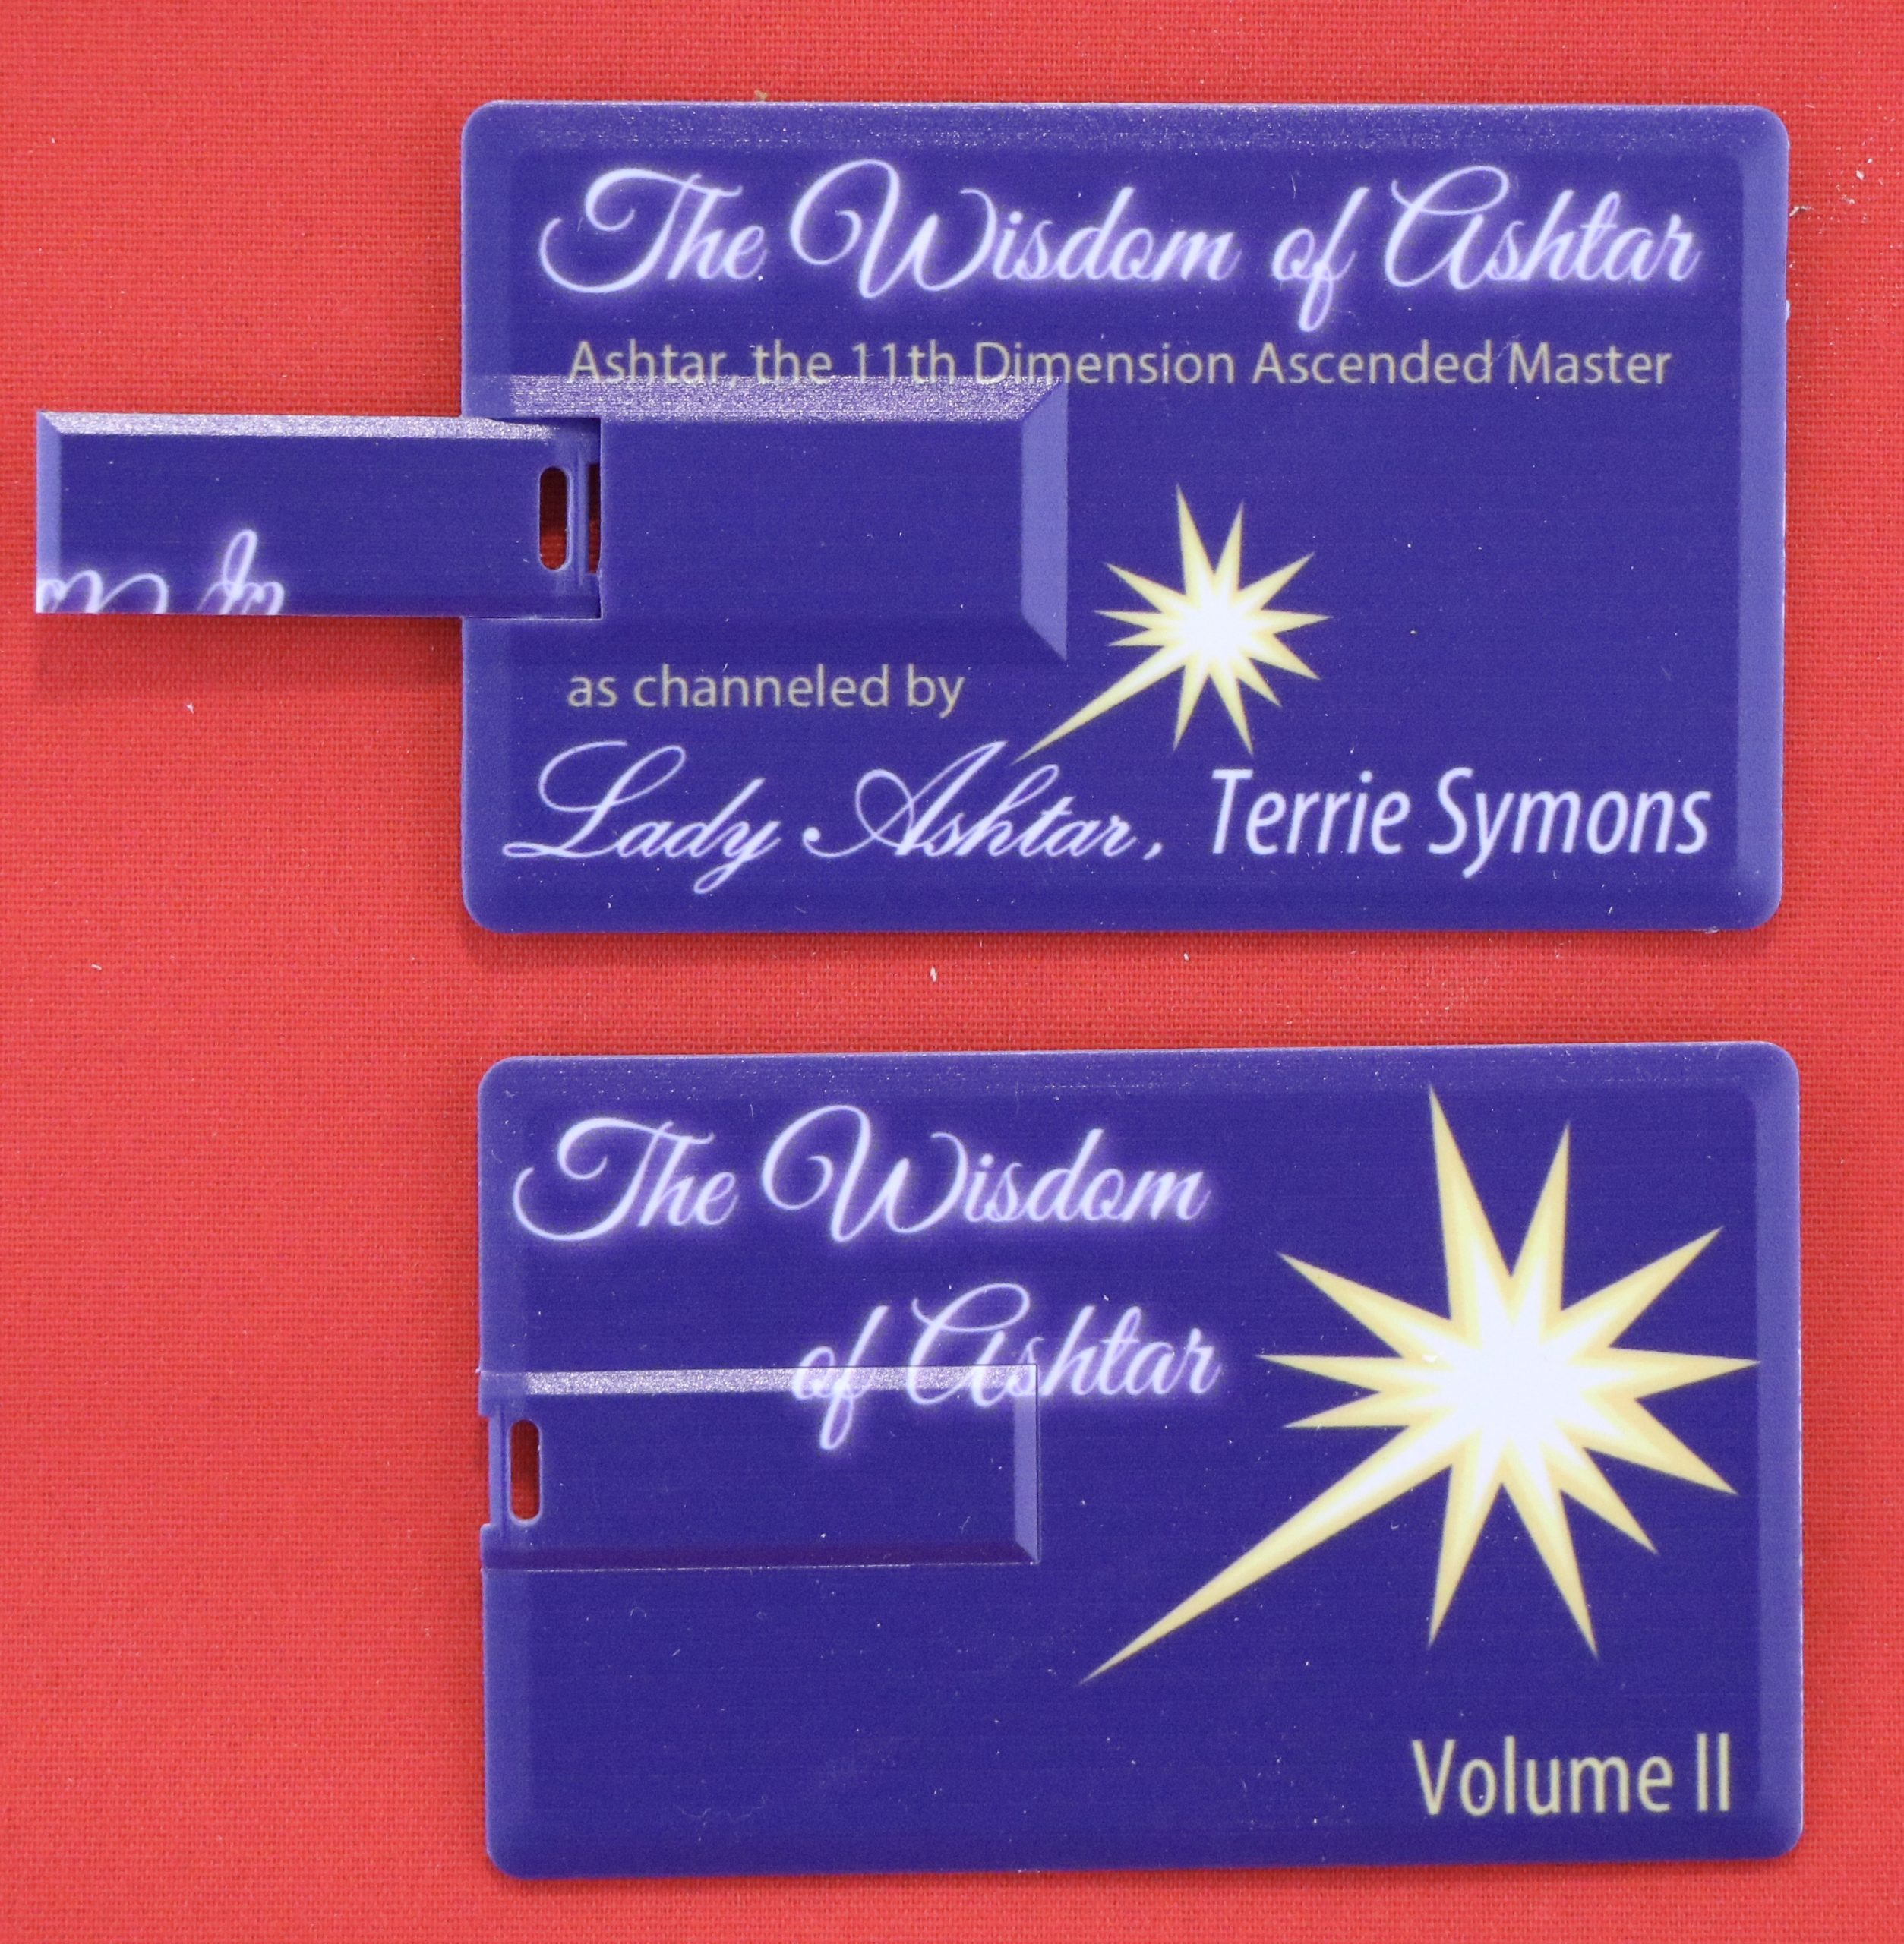 Wisdom of Ashtar Volume II Flash Drive